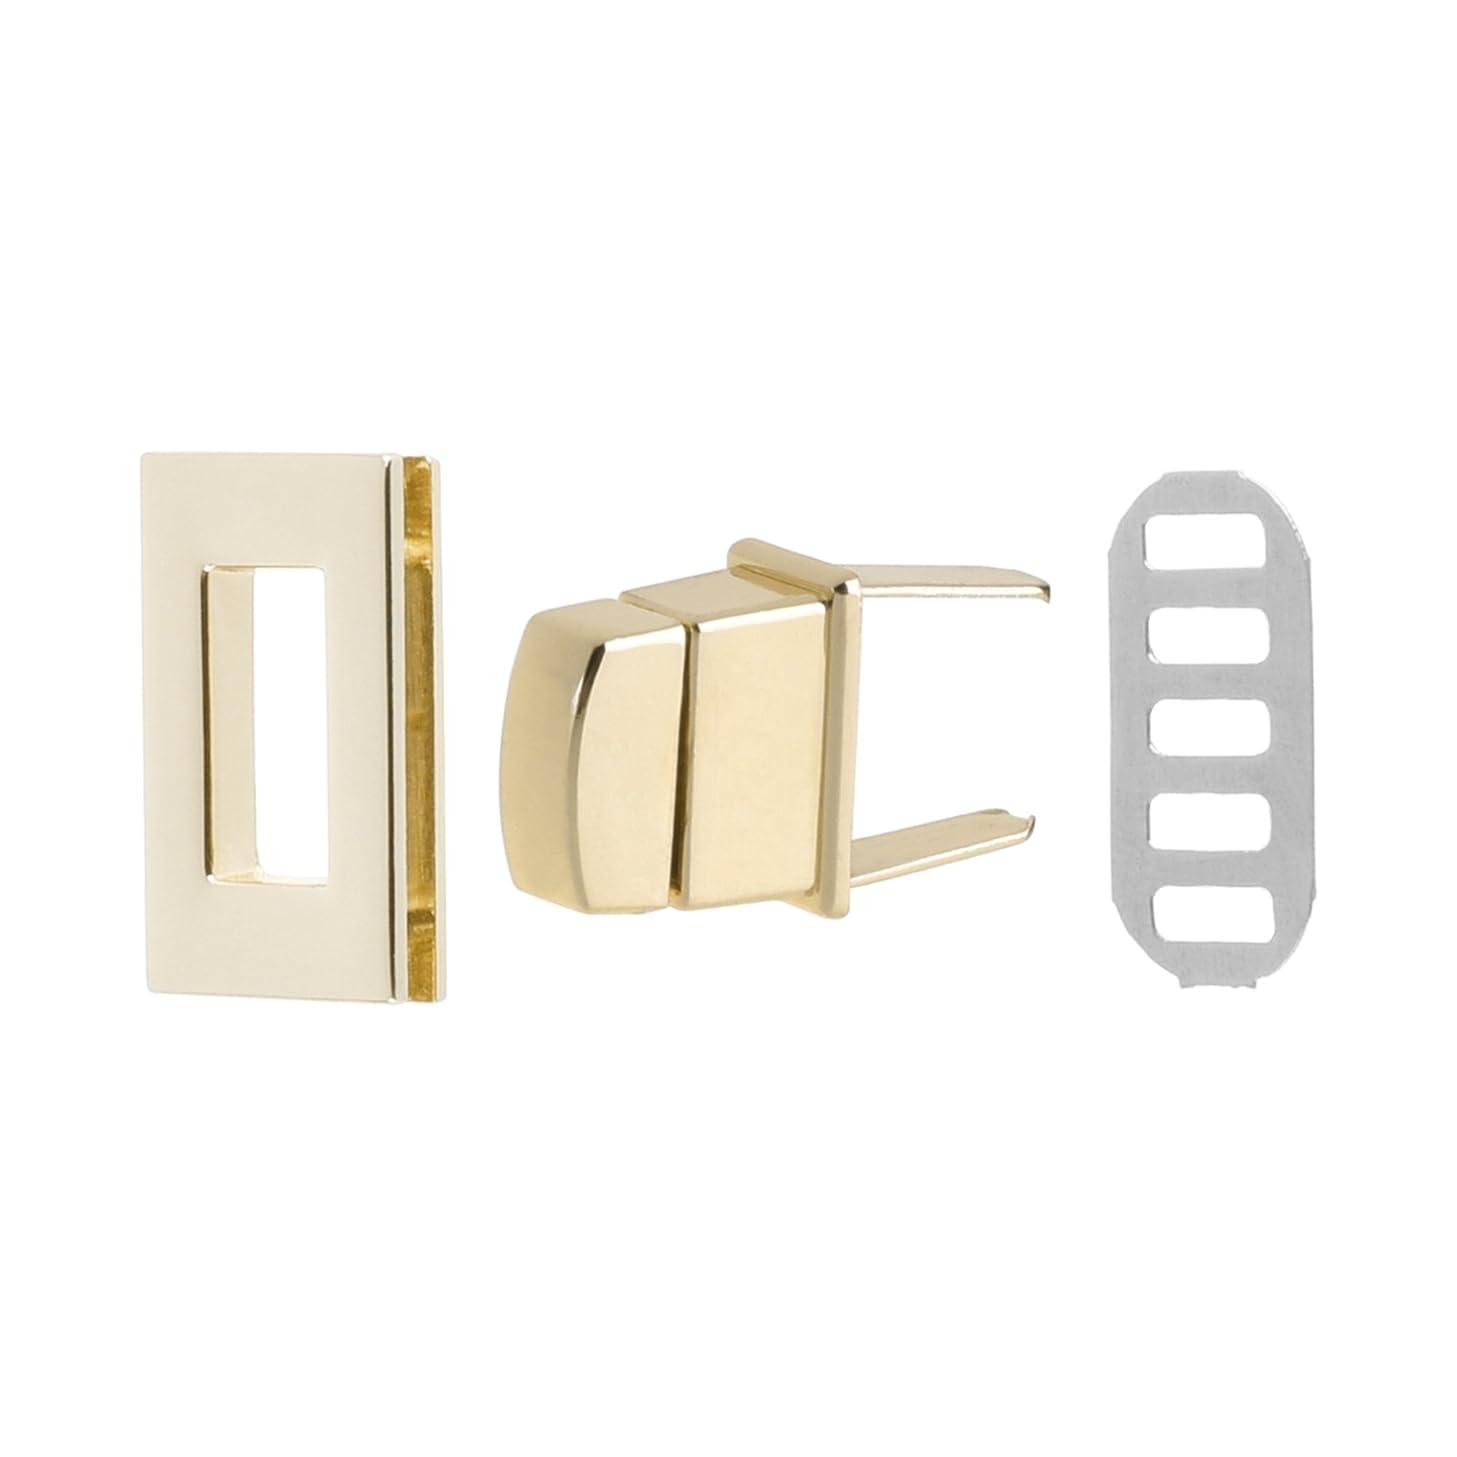 Bluecell 2 Sets Rectangle Turn Lock Clasp Purse Closure Twist Lock for Leathercraft Purse Luggage